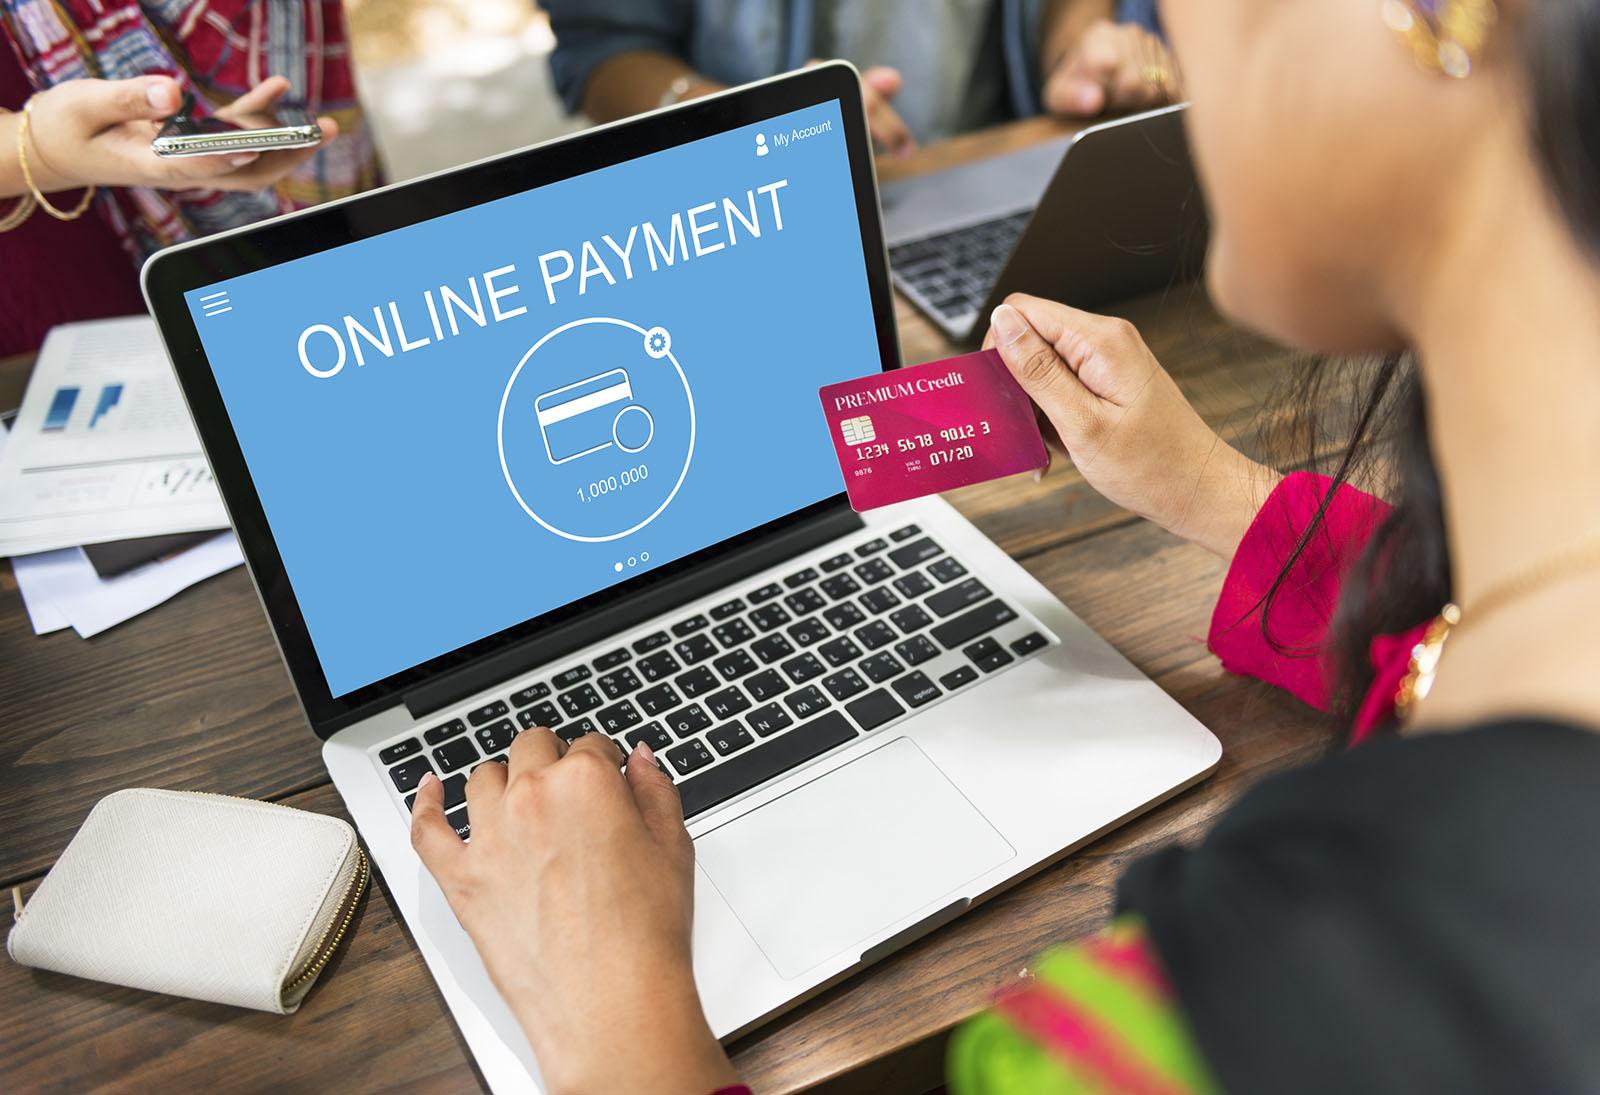 navidor-merchant-services-solutions-paiements-2-4-1.